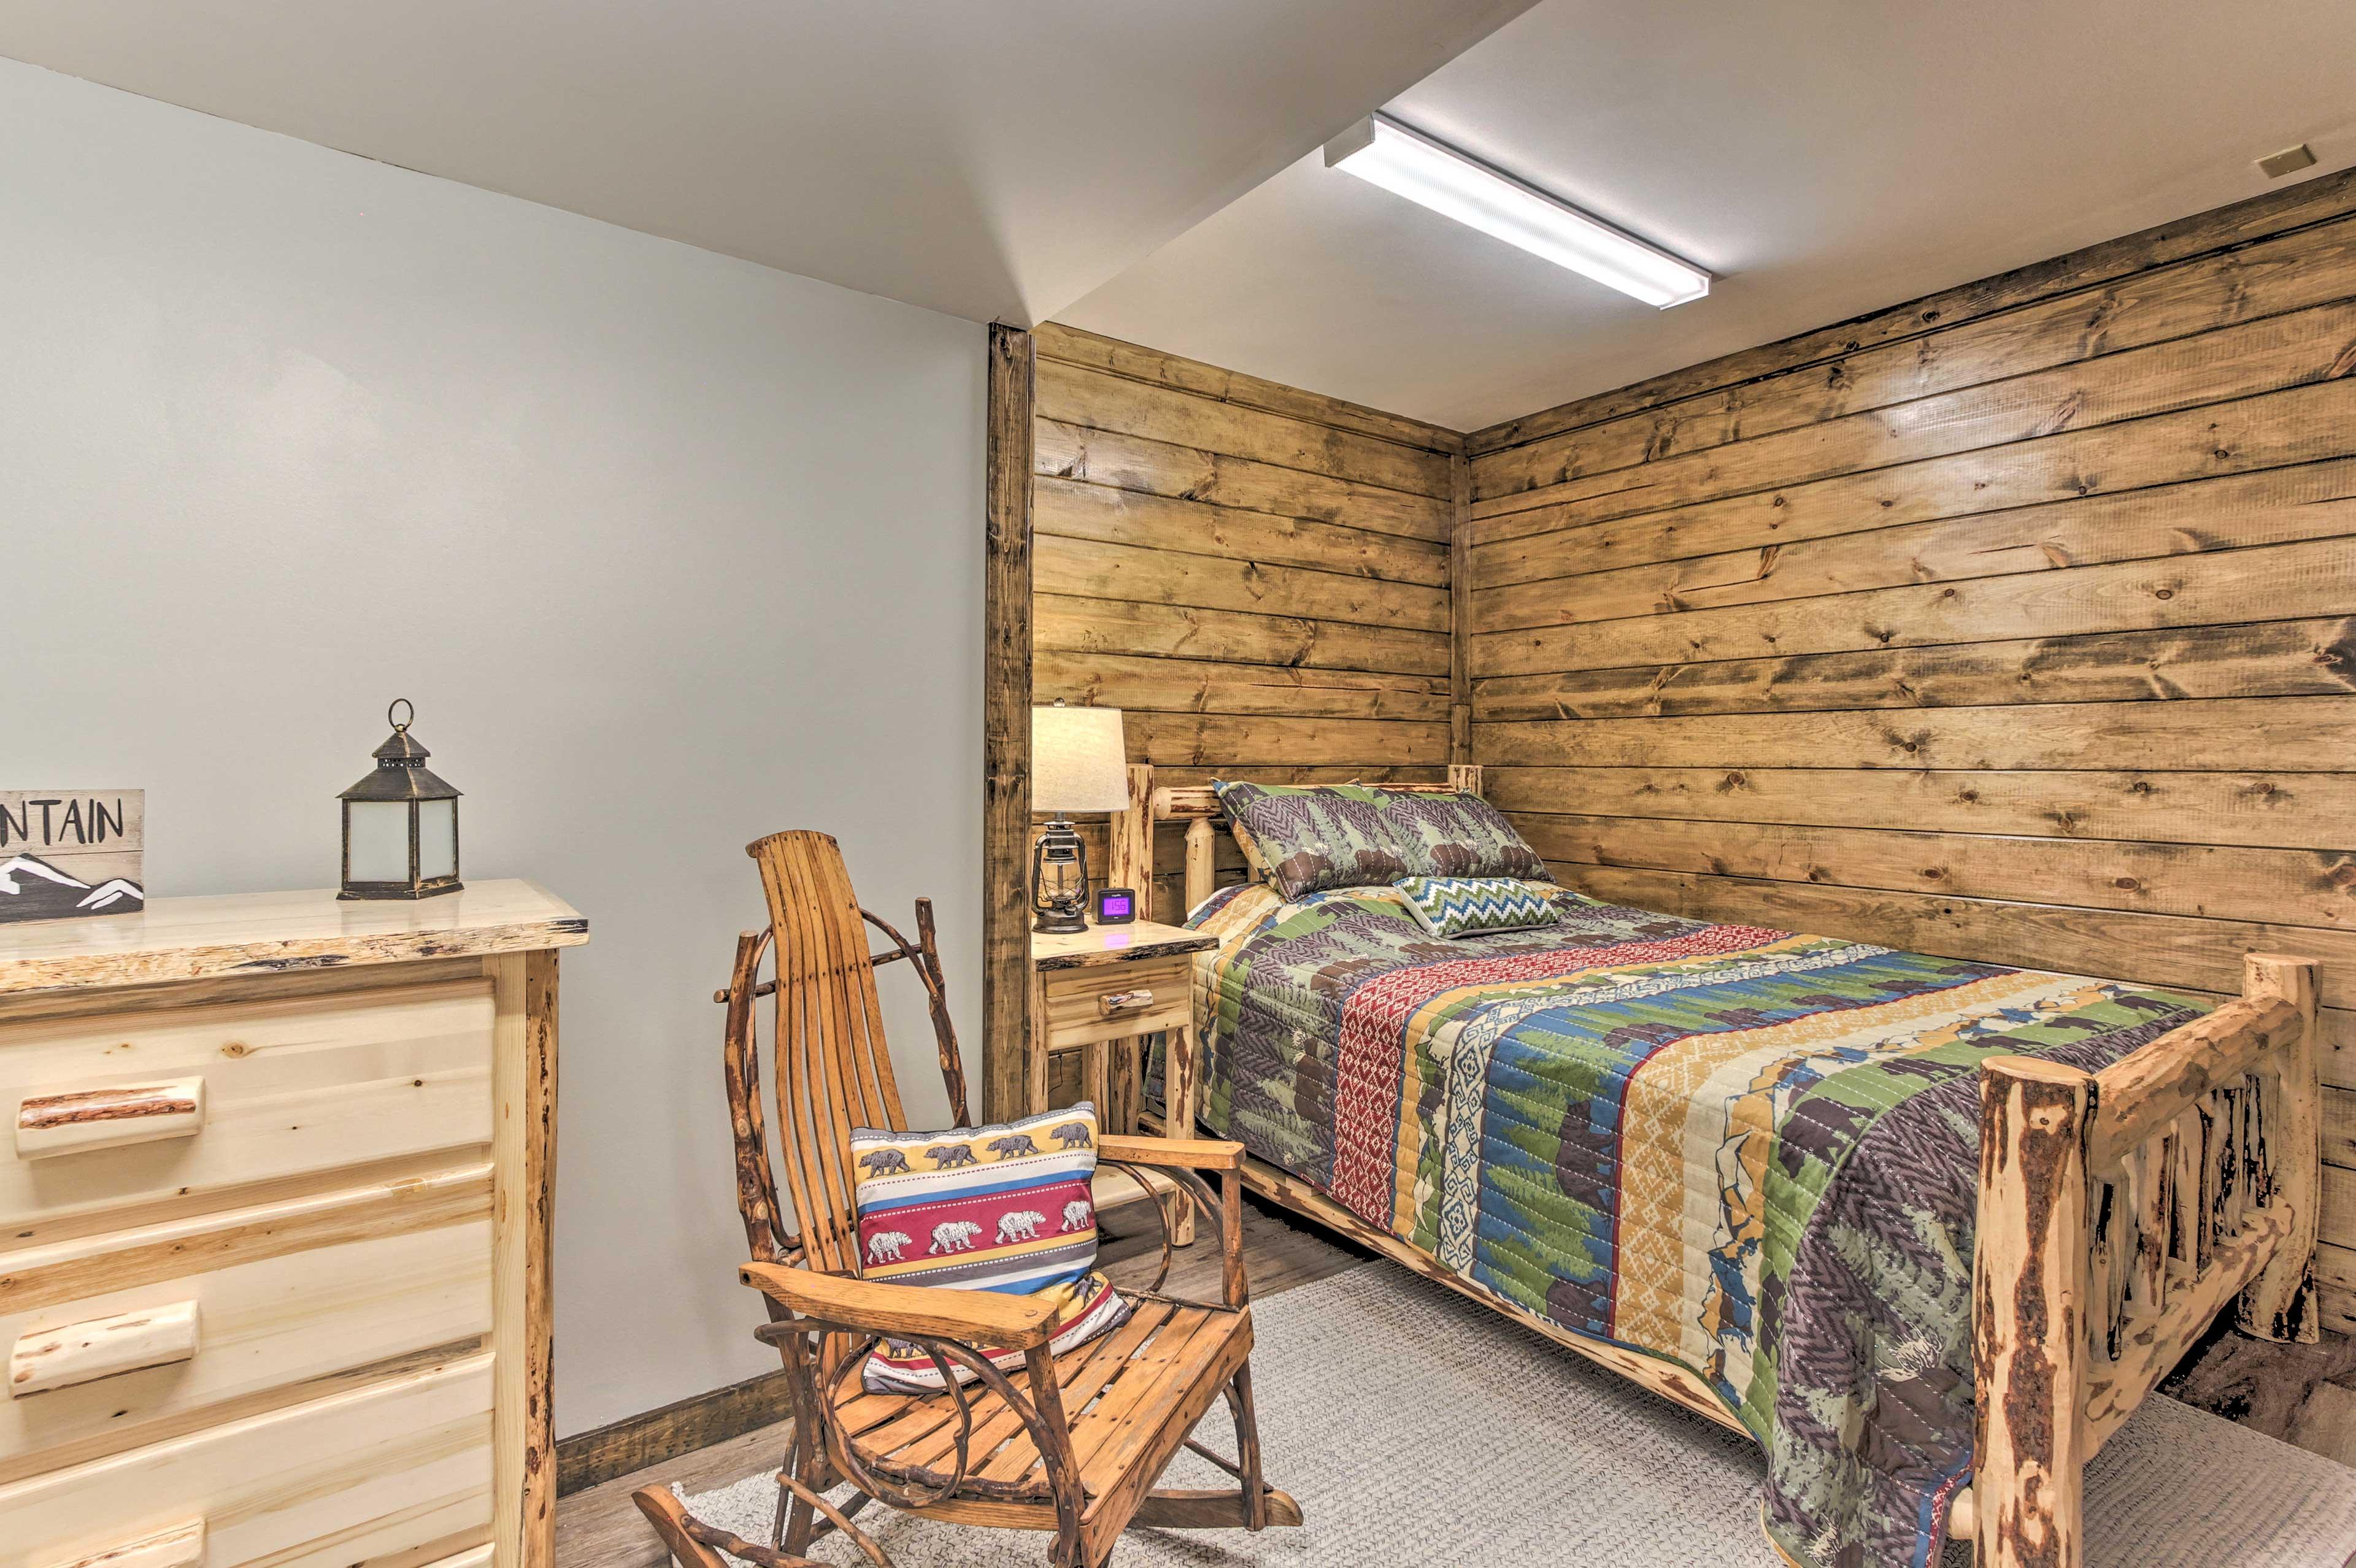 The last bedroom features a queen bed.